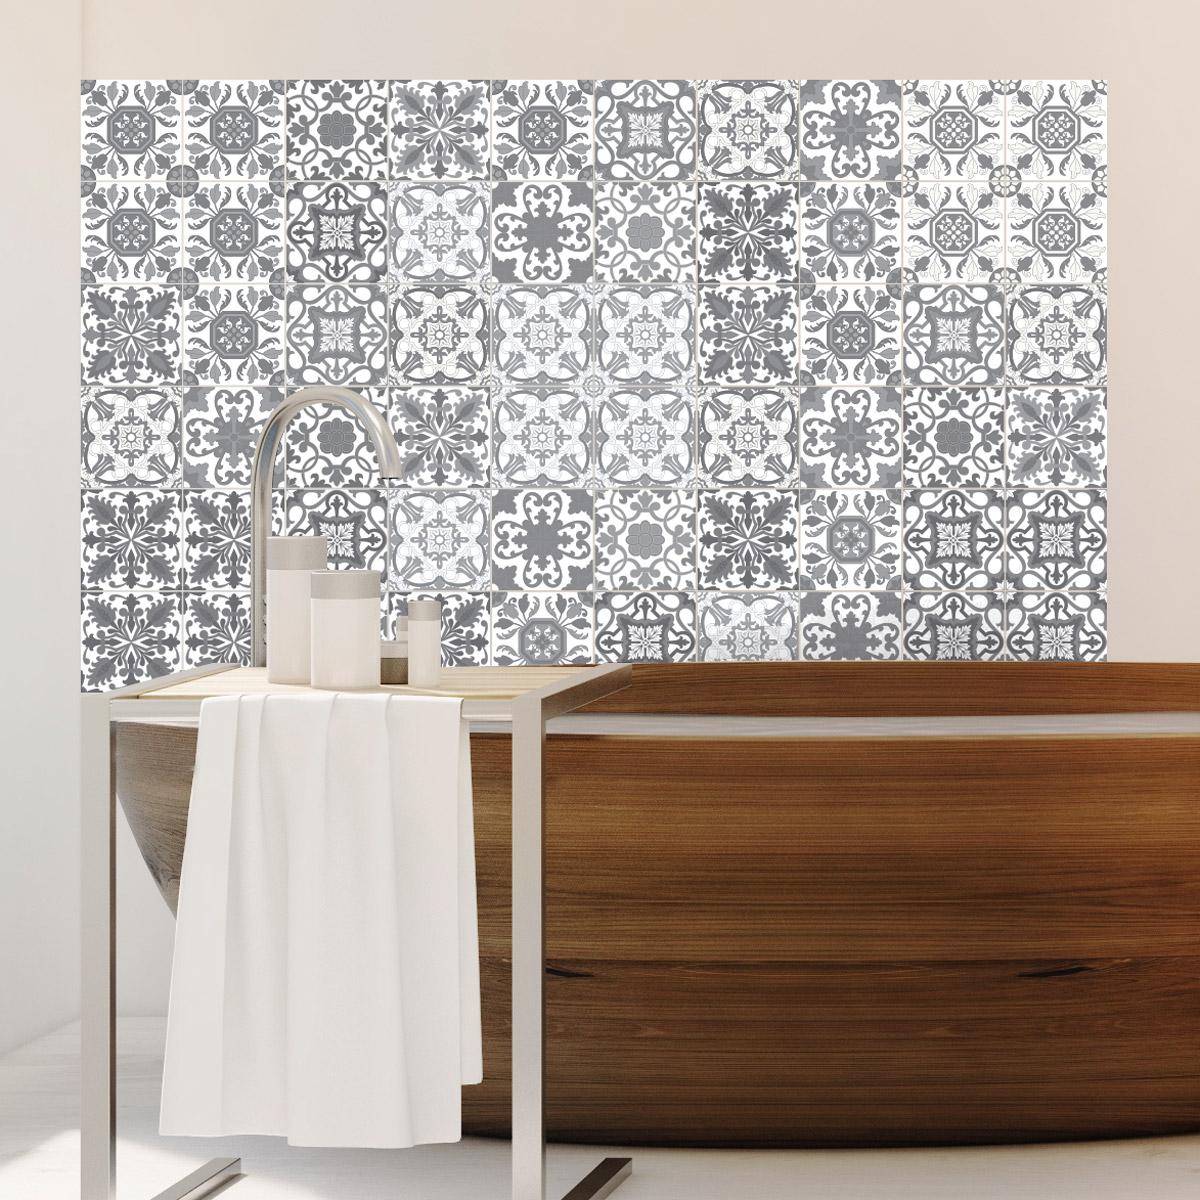 60 stickers carrelages azulejos vintage nuance de gris art et design artistiques ambiance. Black Bedroom Furniture Sets. Home Design Ideas